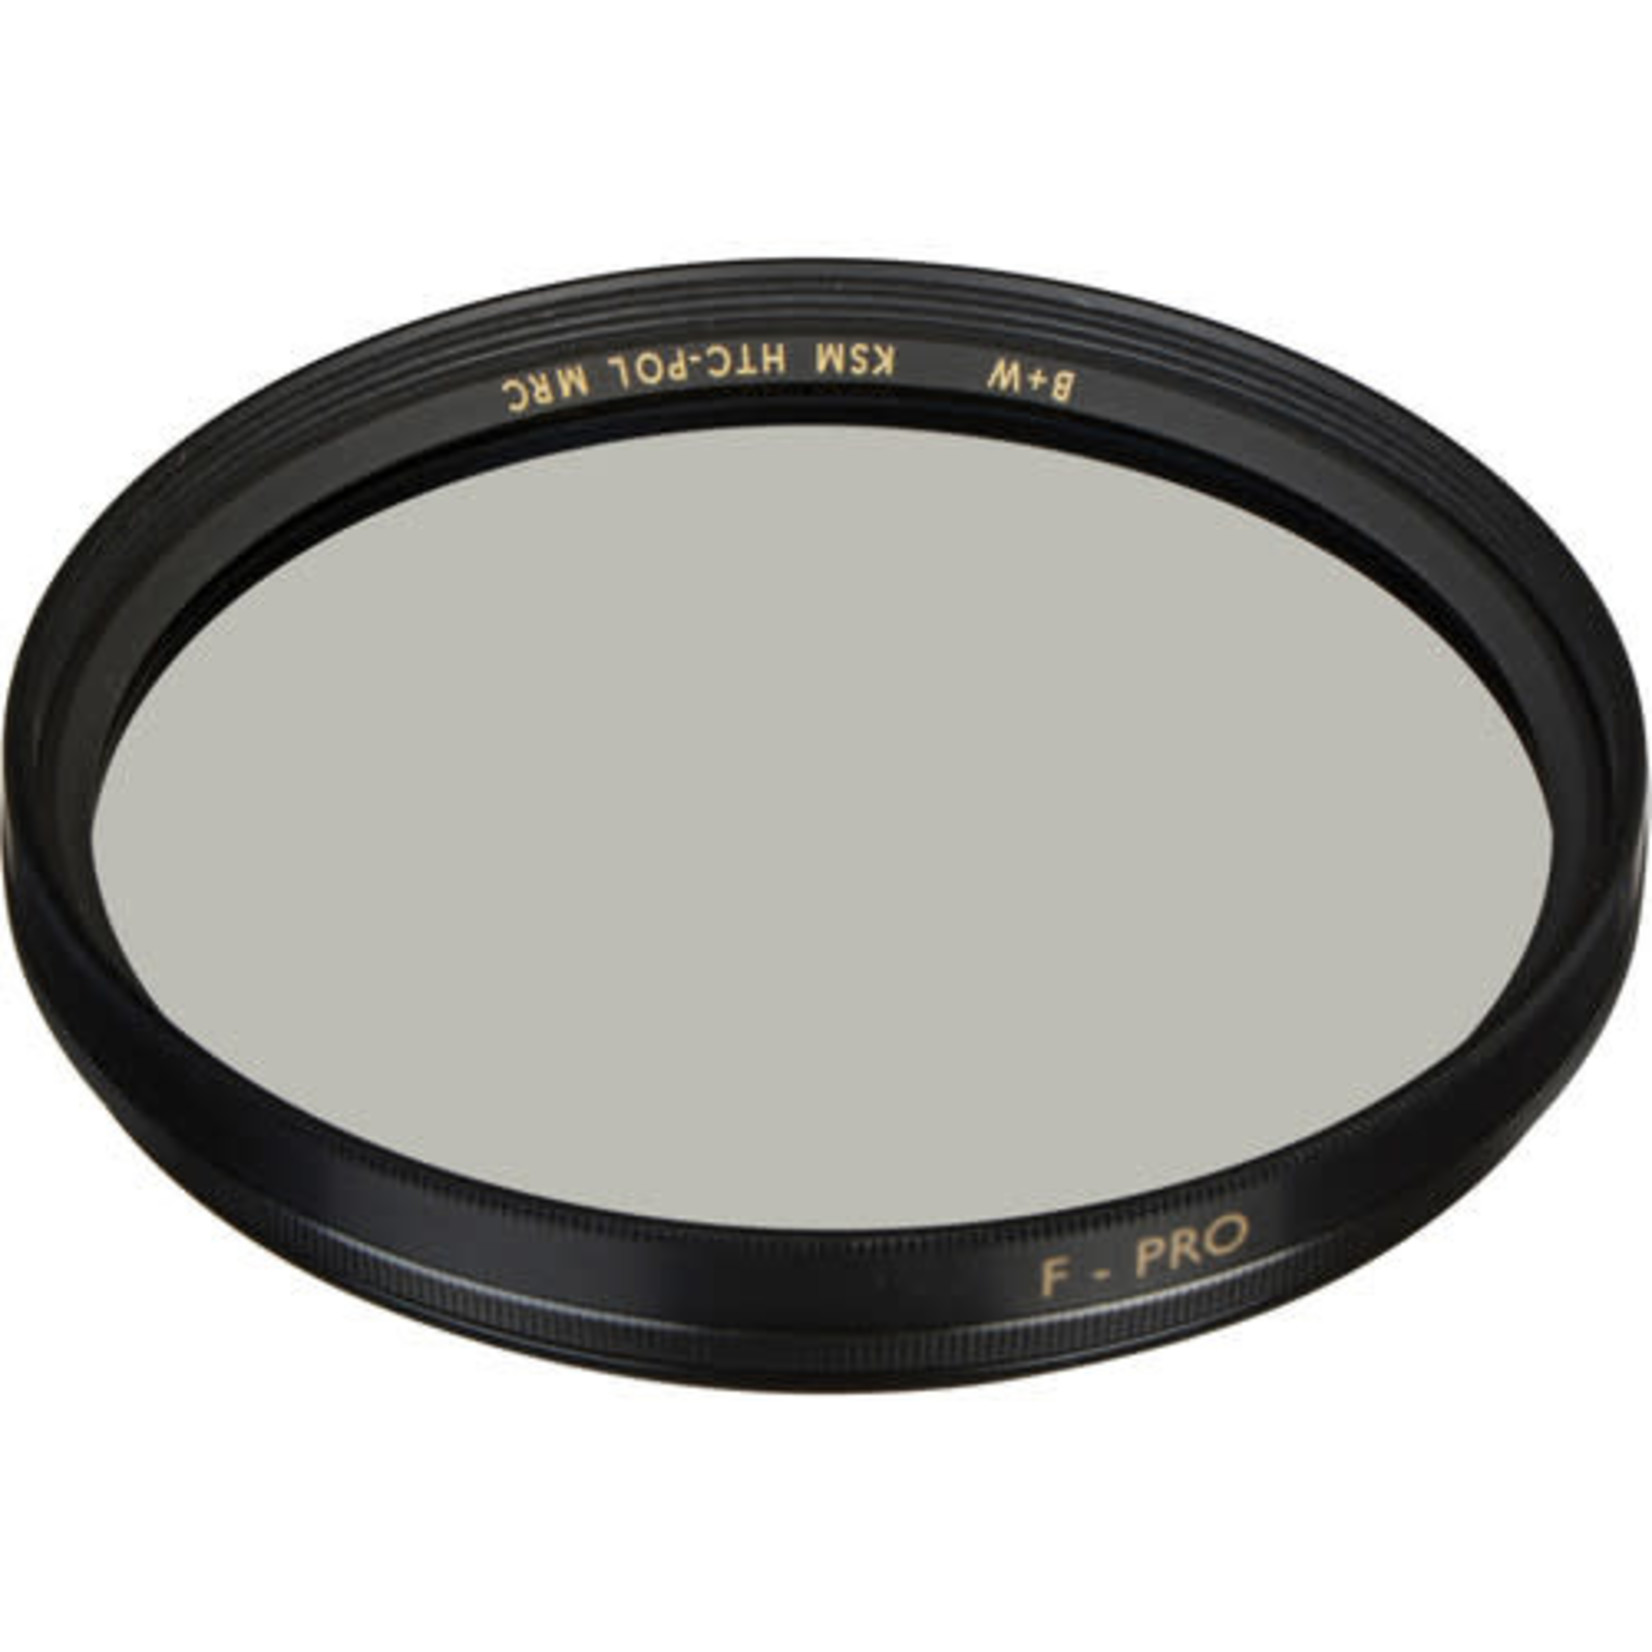 B+W B+W 62mm F-Pro Kaesemann High Transmission Circular Polarizer MRC Filter